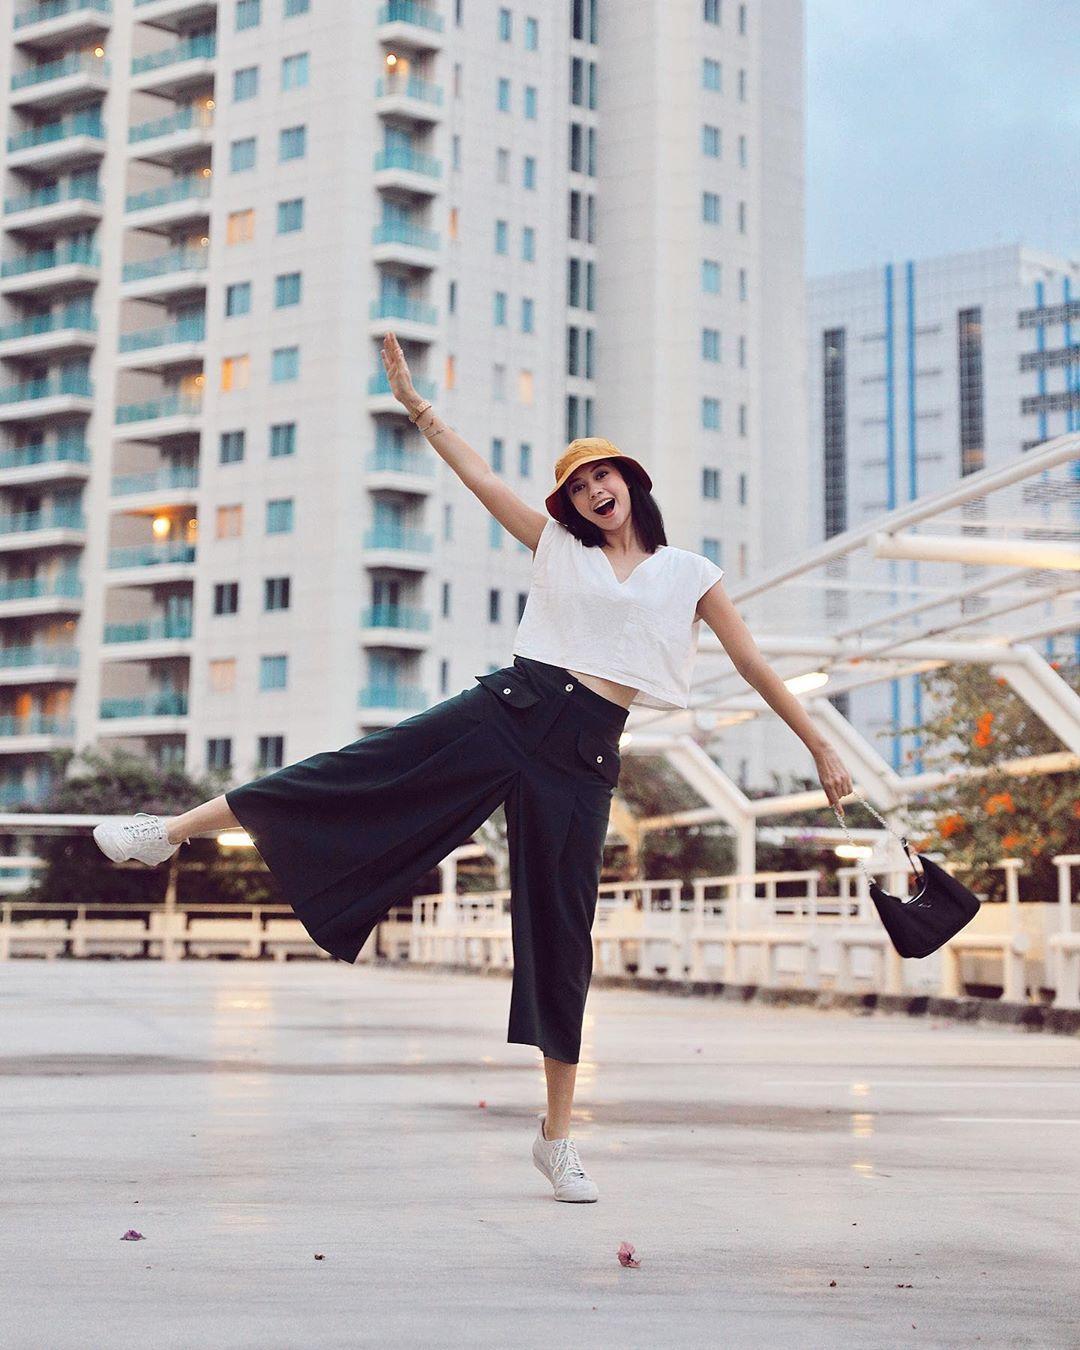 5 Ide OOTD Yuki Kato yang Bisa Kamu Jiplak